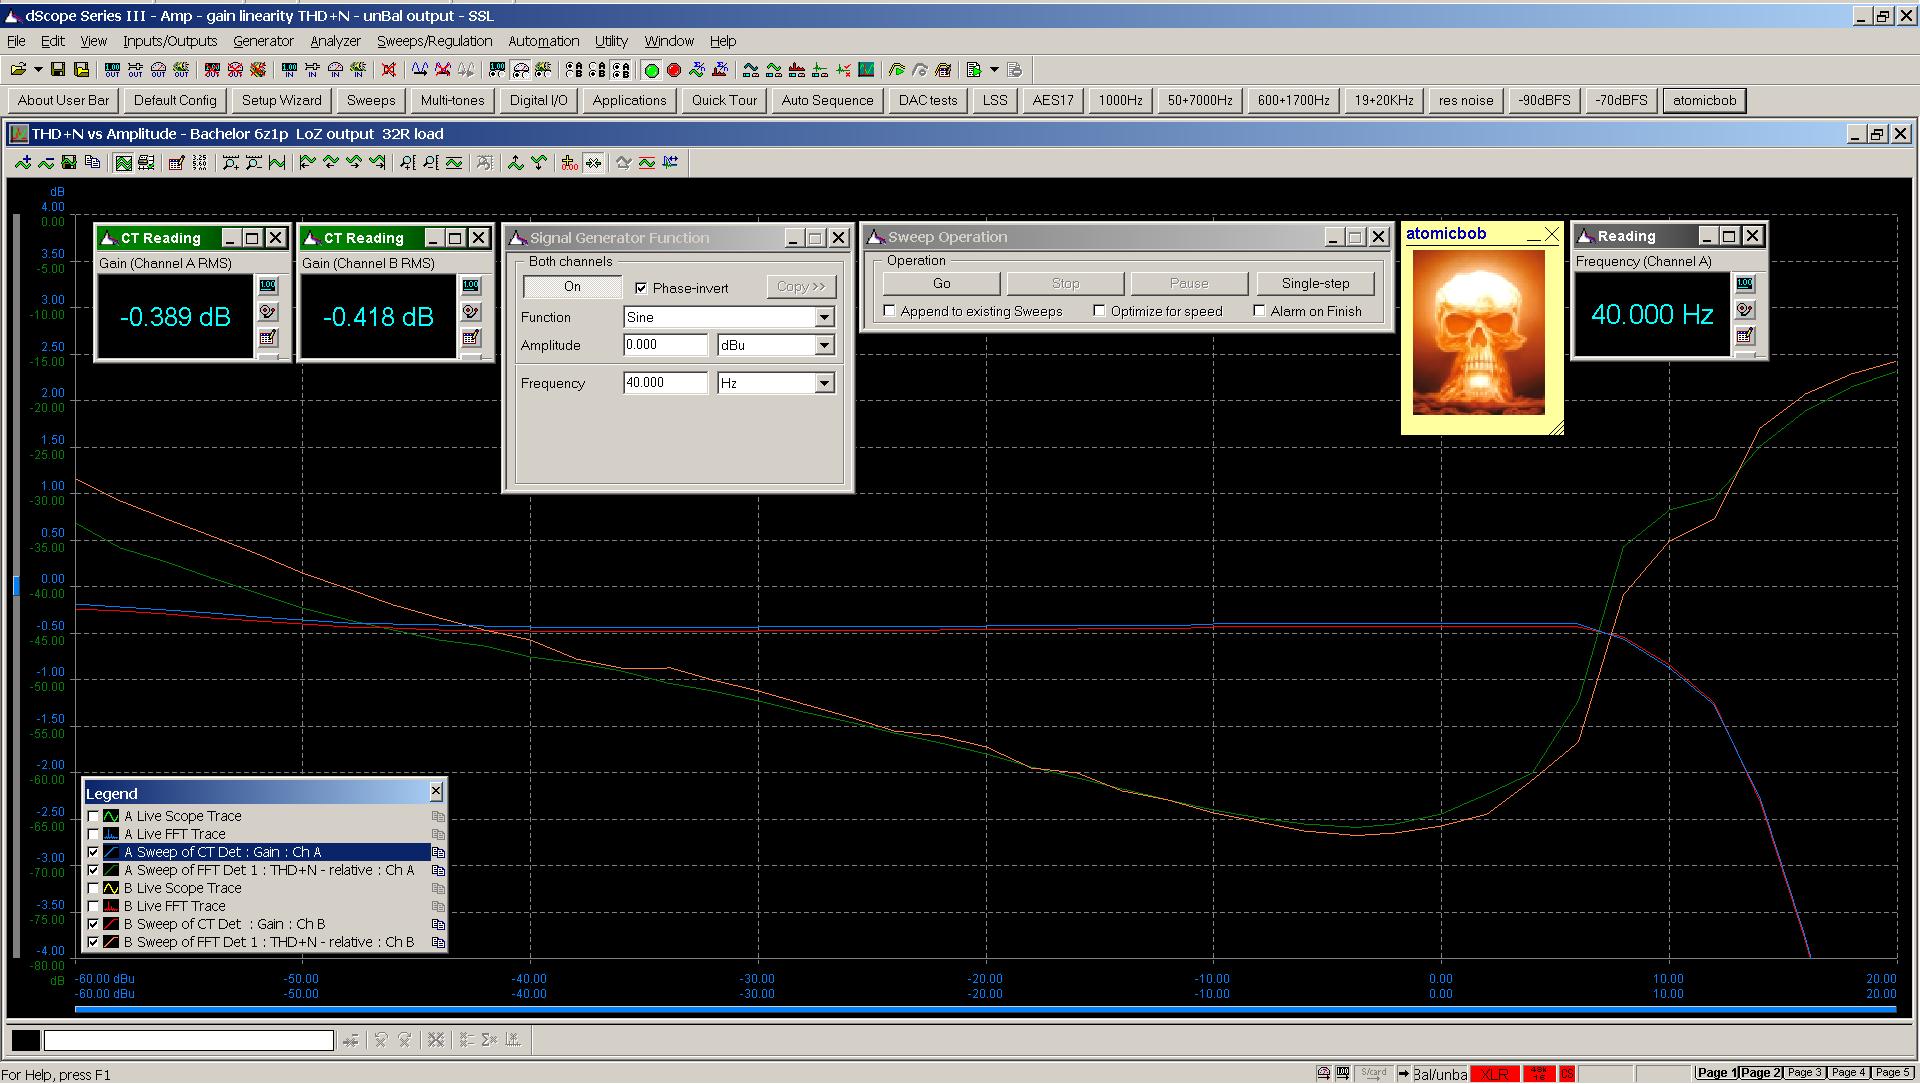 08 20200622 Bachelor 6z1p 40Hz gain linearity THD+N sweep 32R LoZ 0dB gain.png